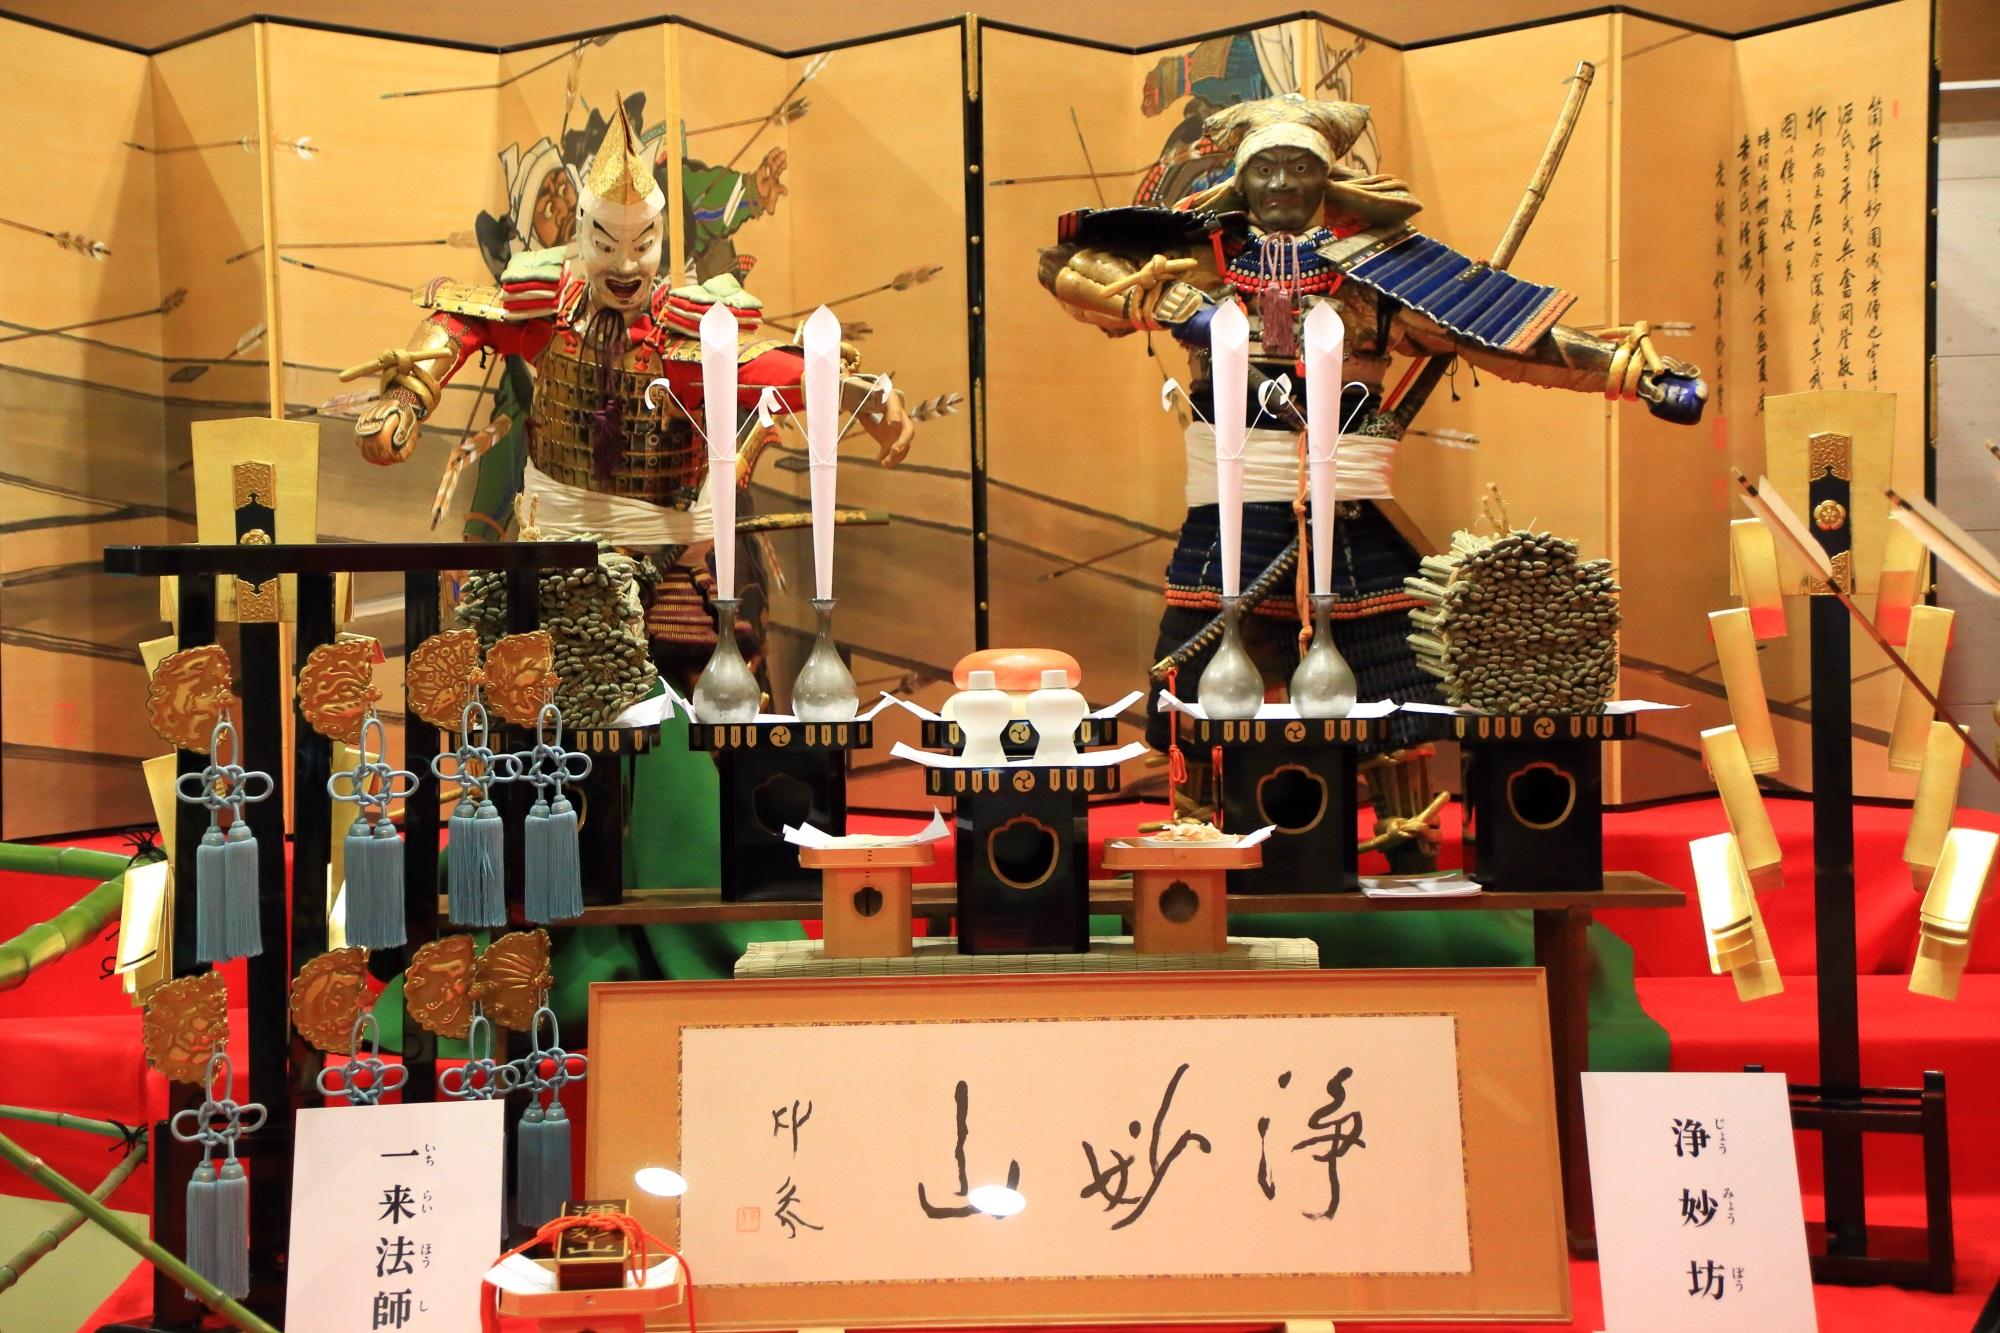 浄妙山 祇園祭後祭 宵山 夏の風物詩